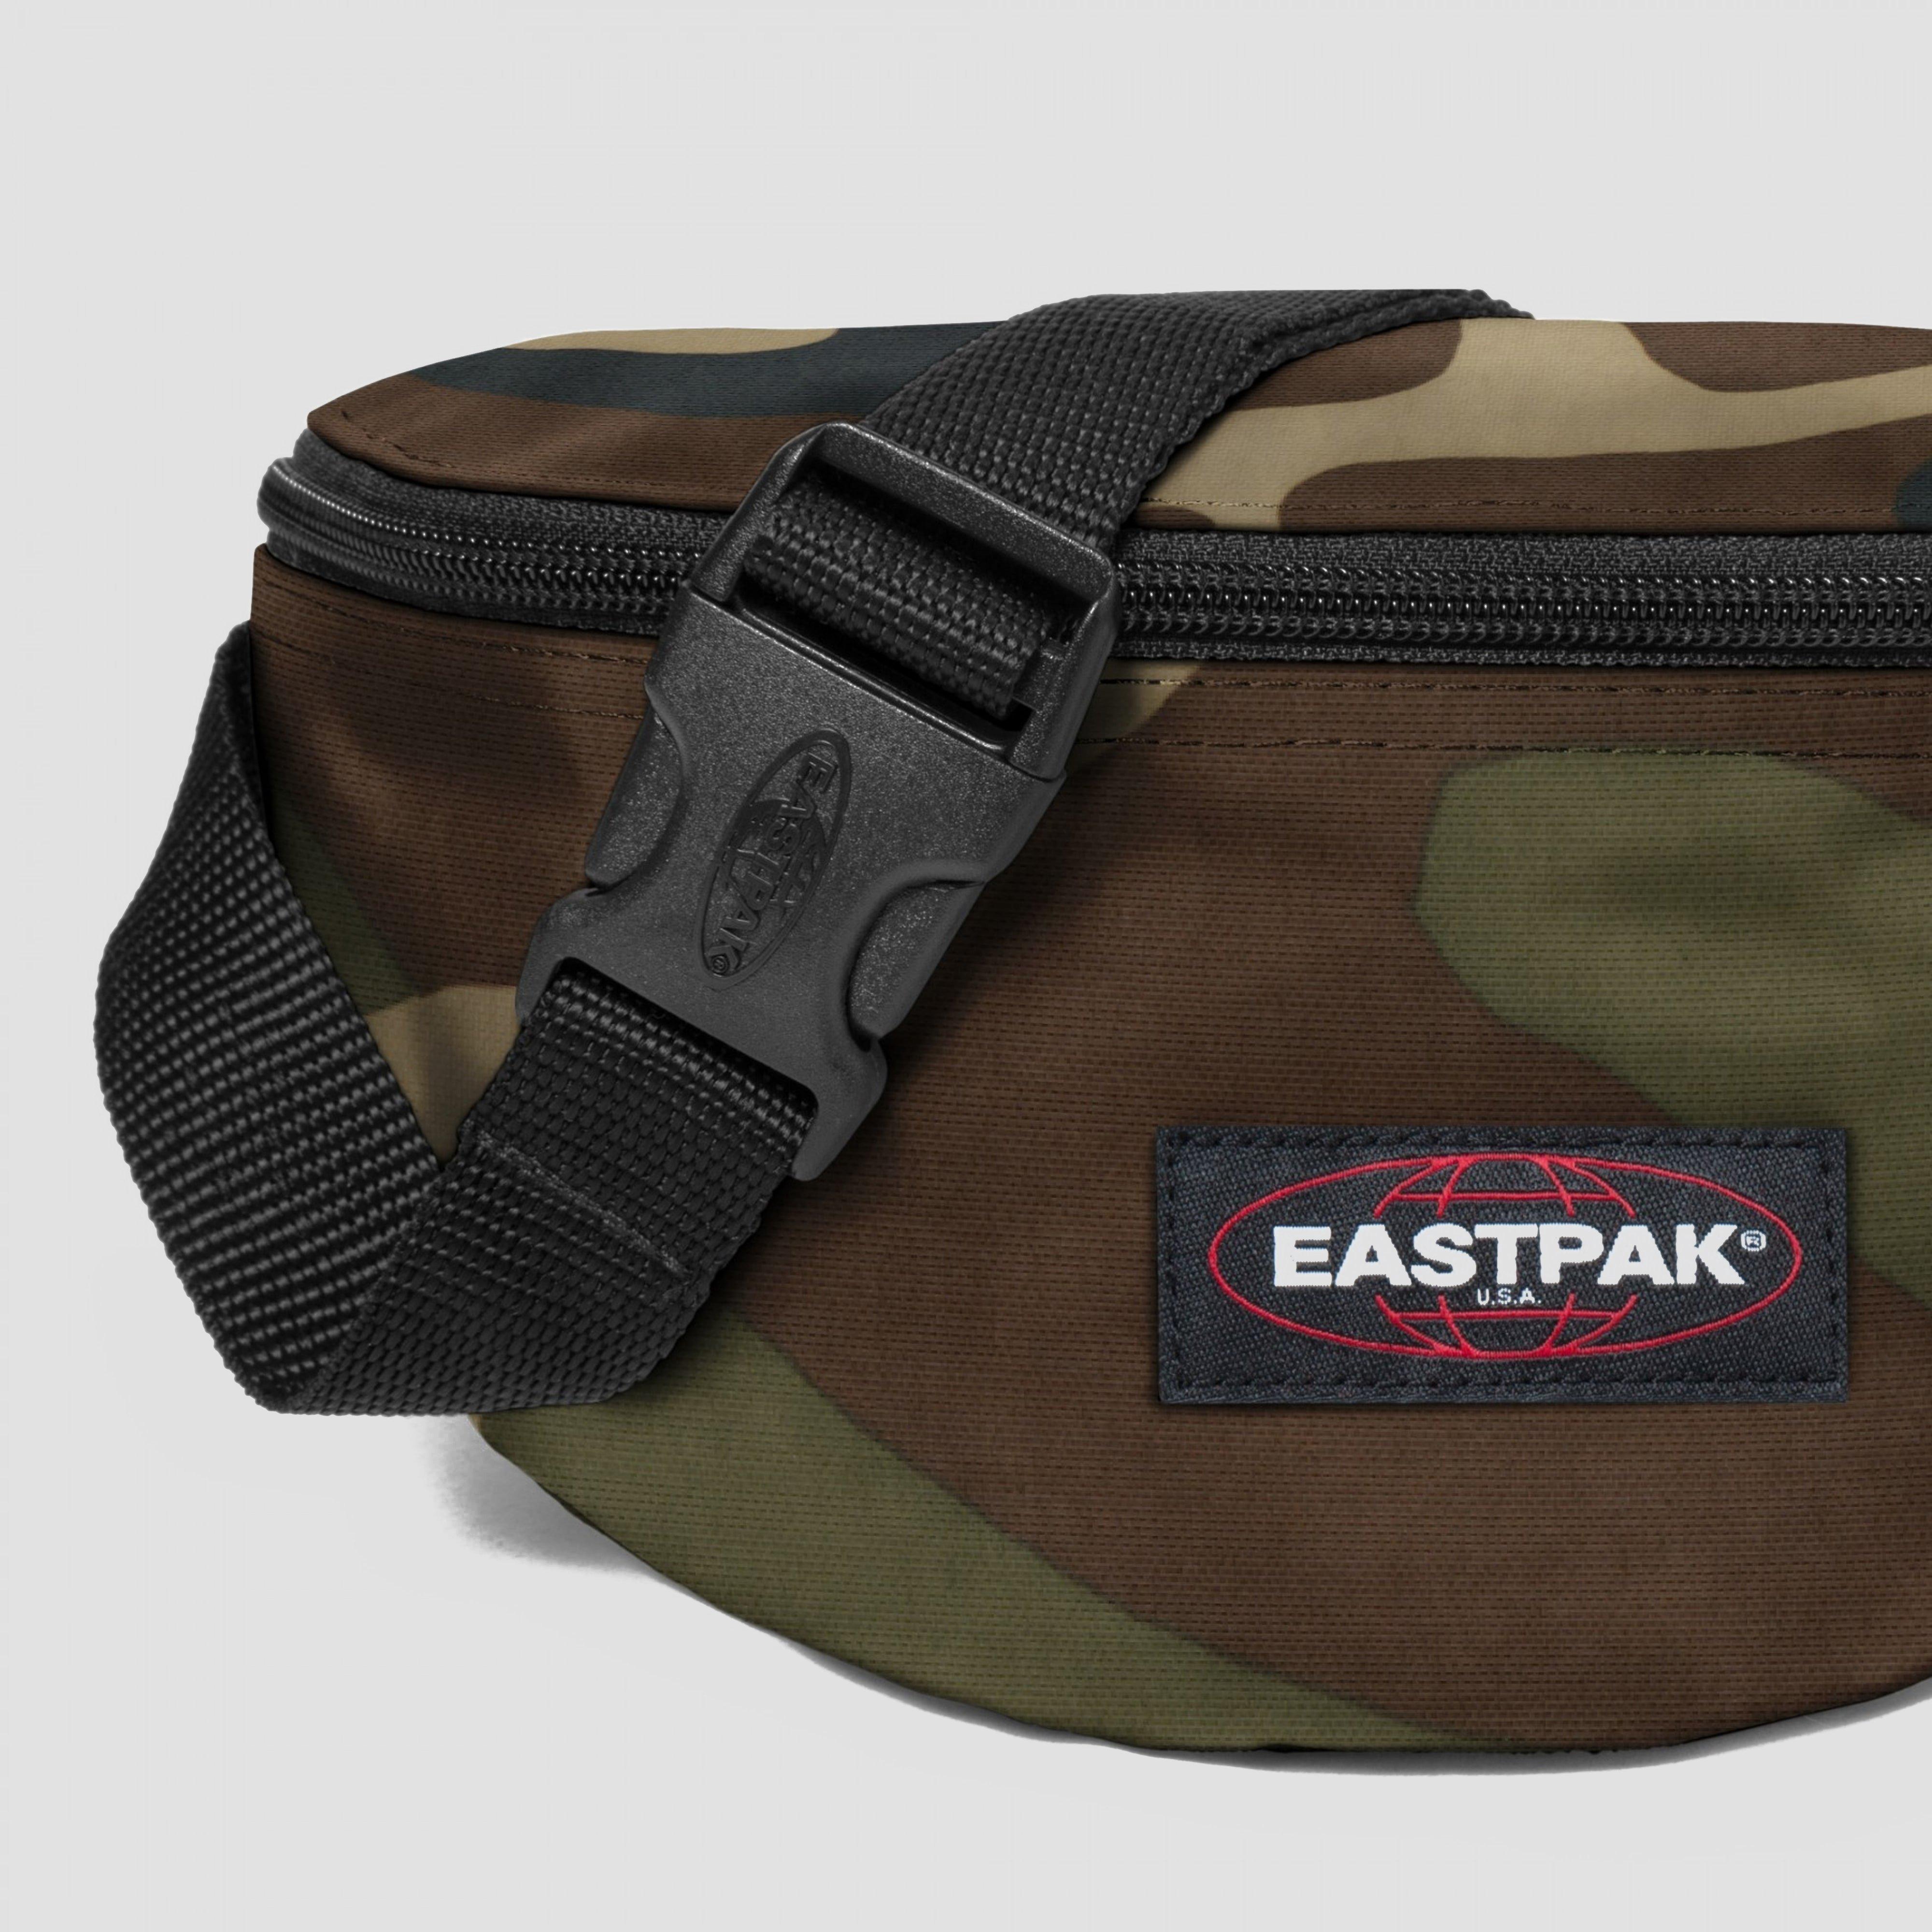 EASTPAK SPRINGER HEUPTAS GROEN/BRUIN